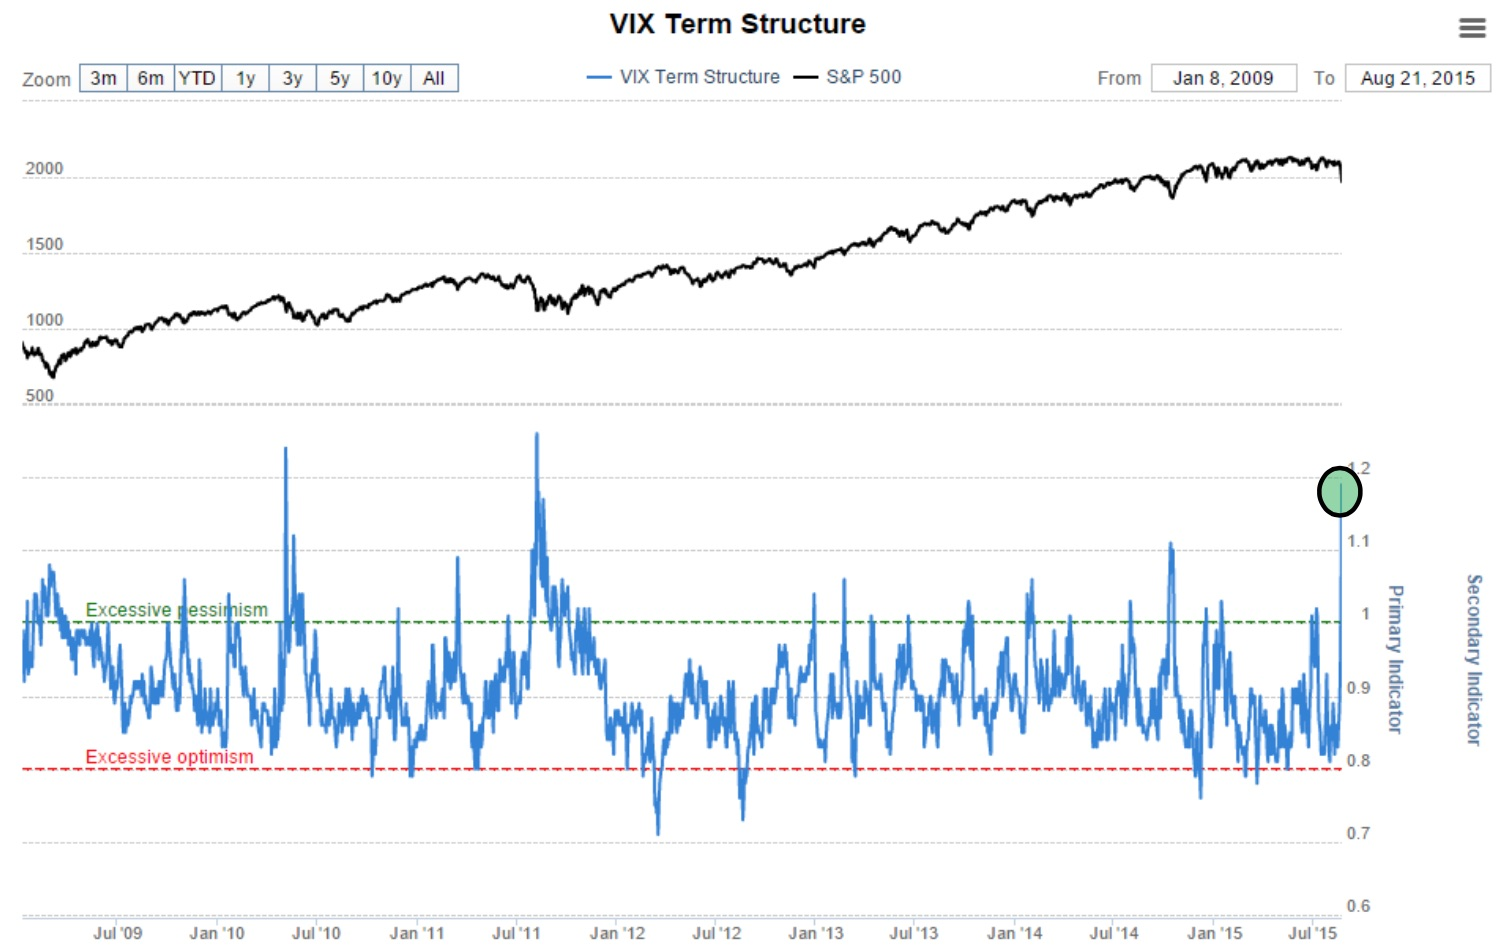 Global option trading volume